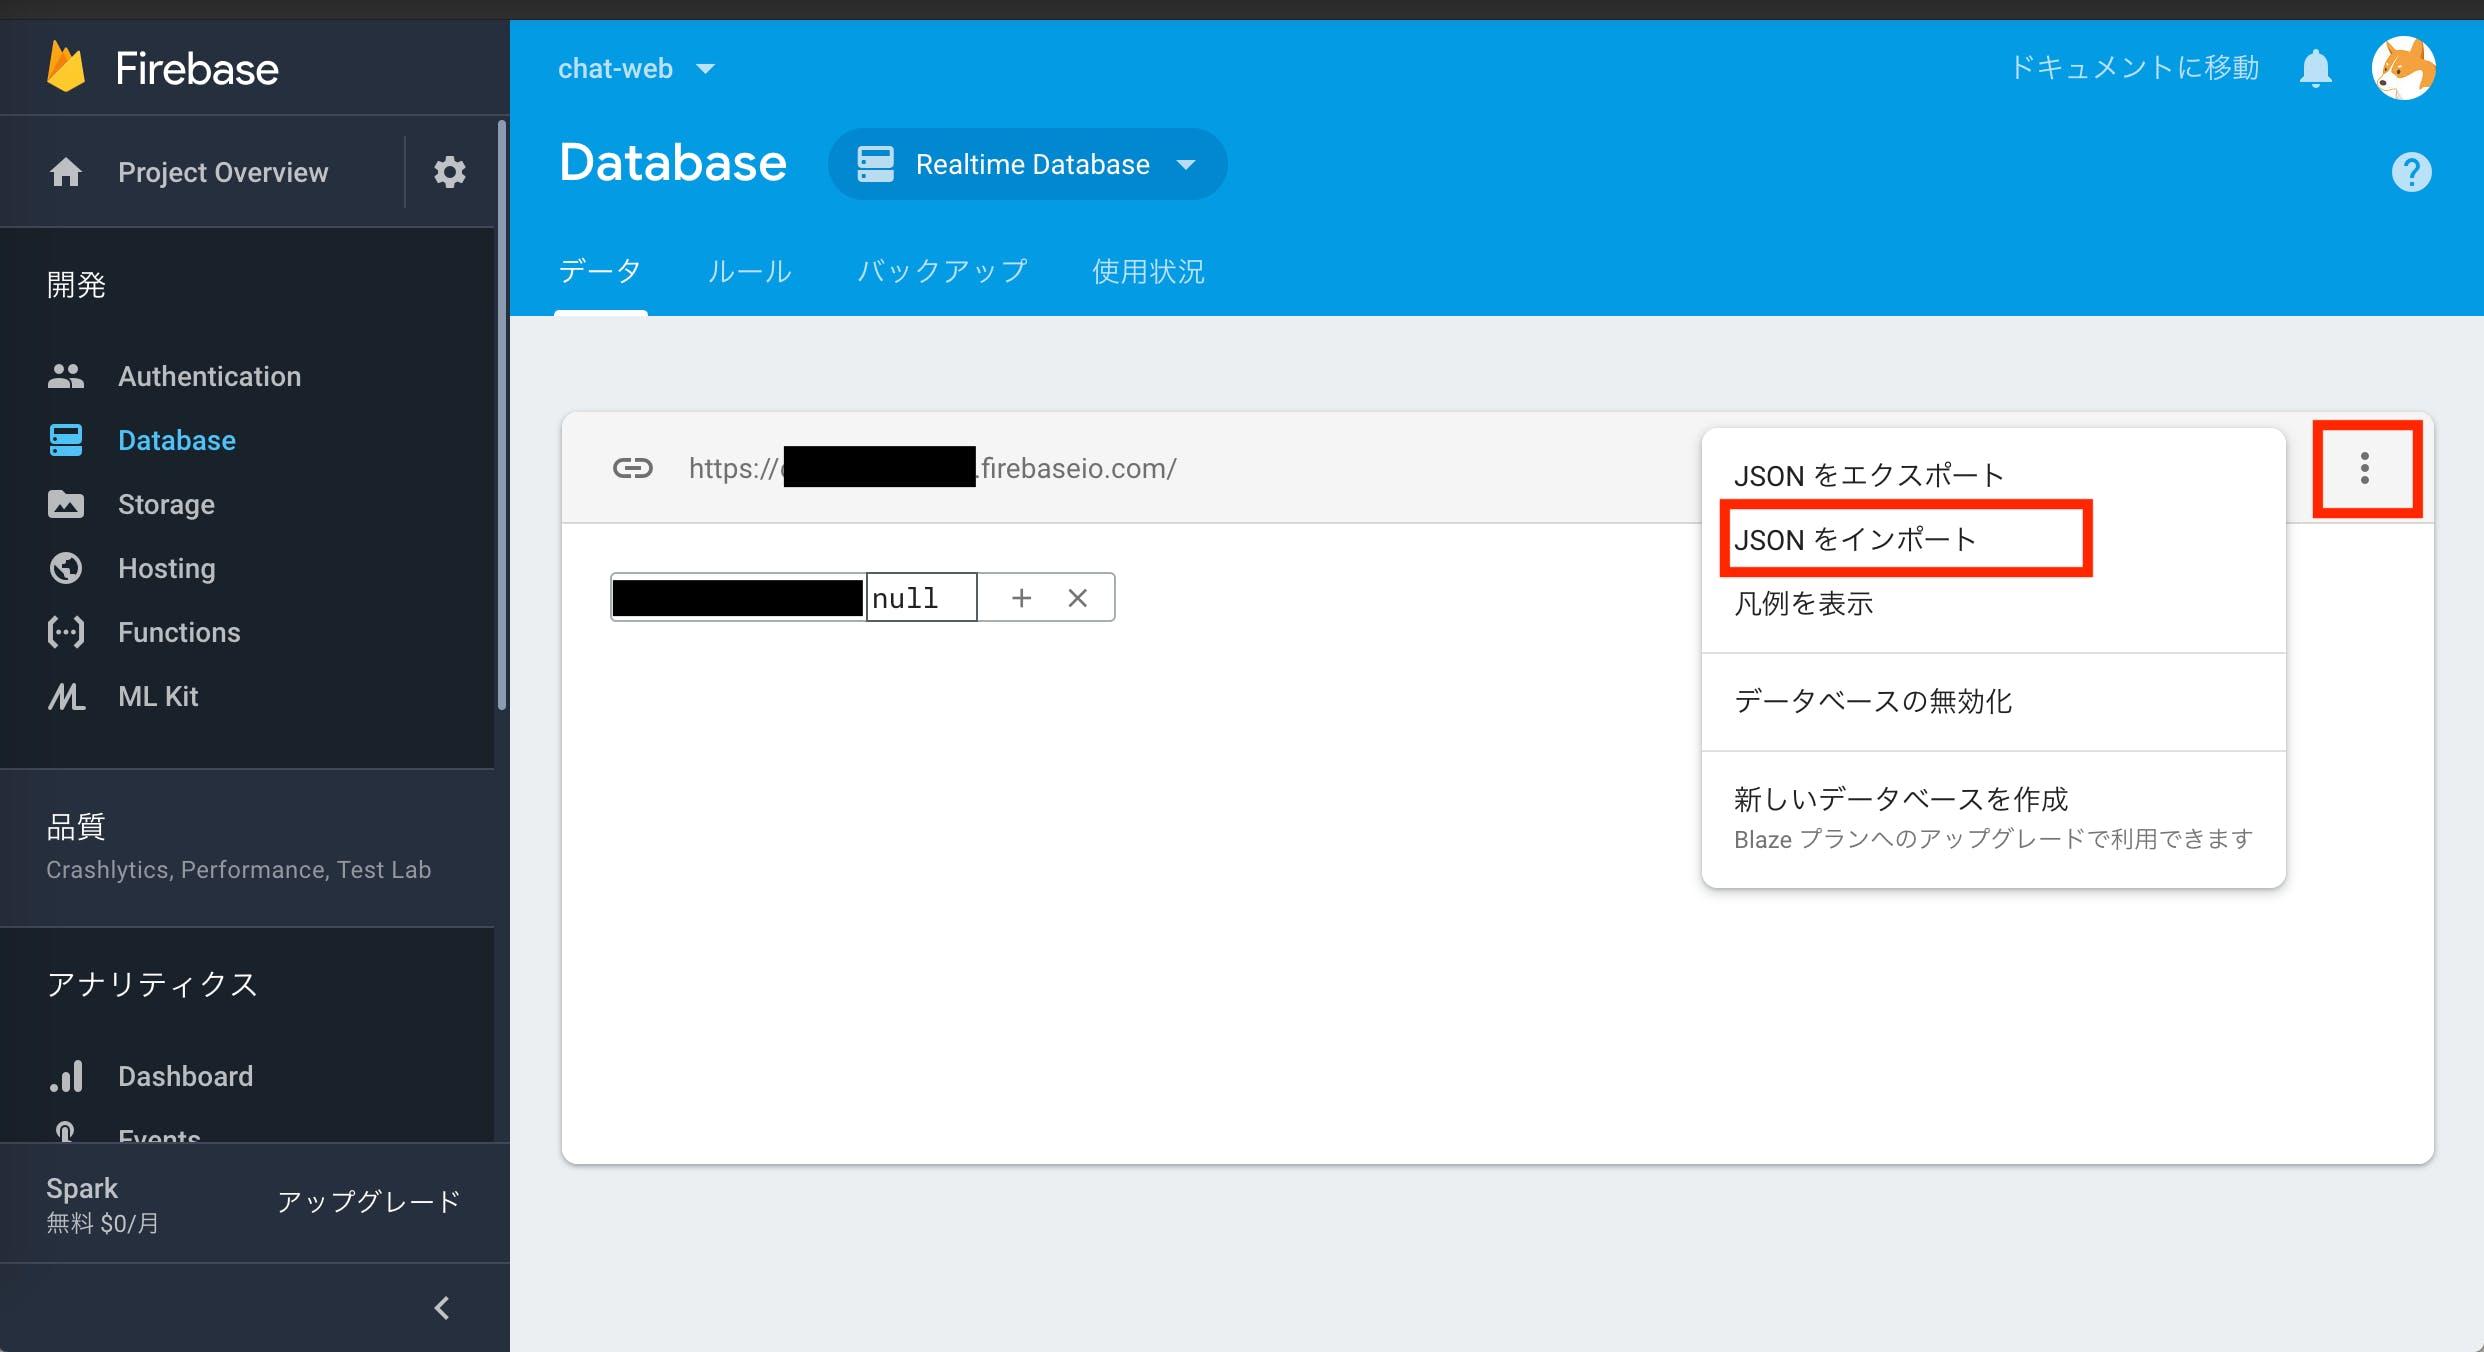 Firebase Web CodelabのFriendly Chatチュートリアルのメモ - Qiita